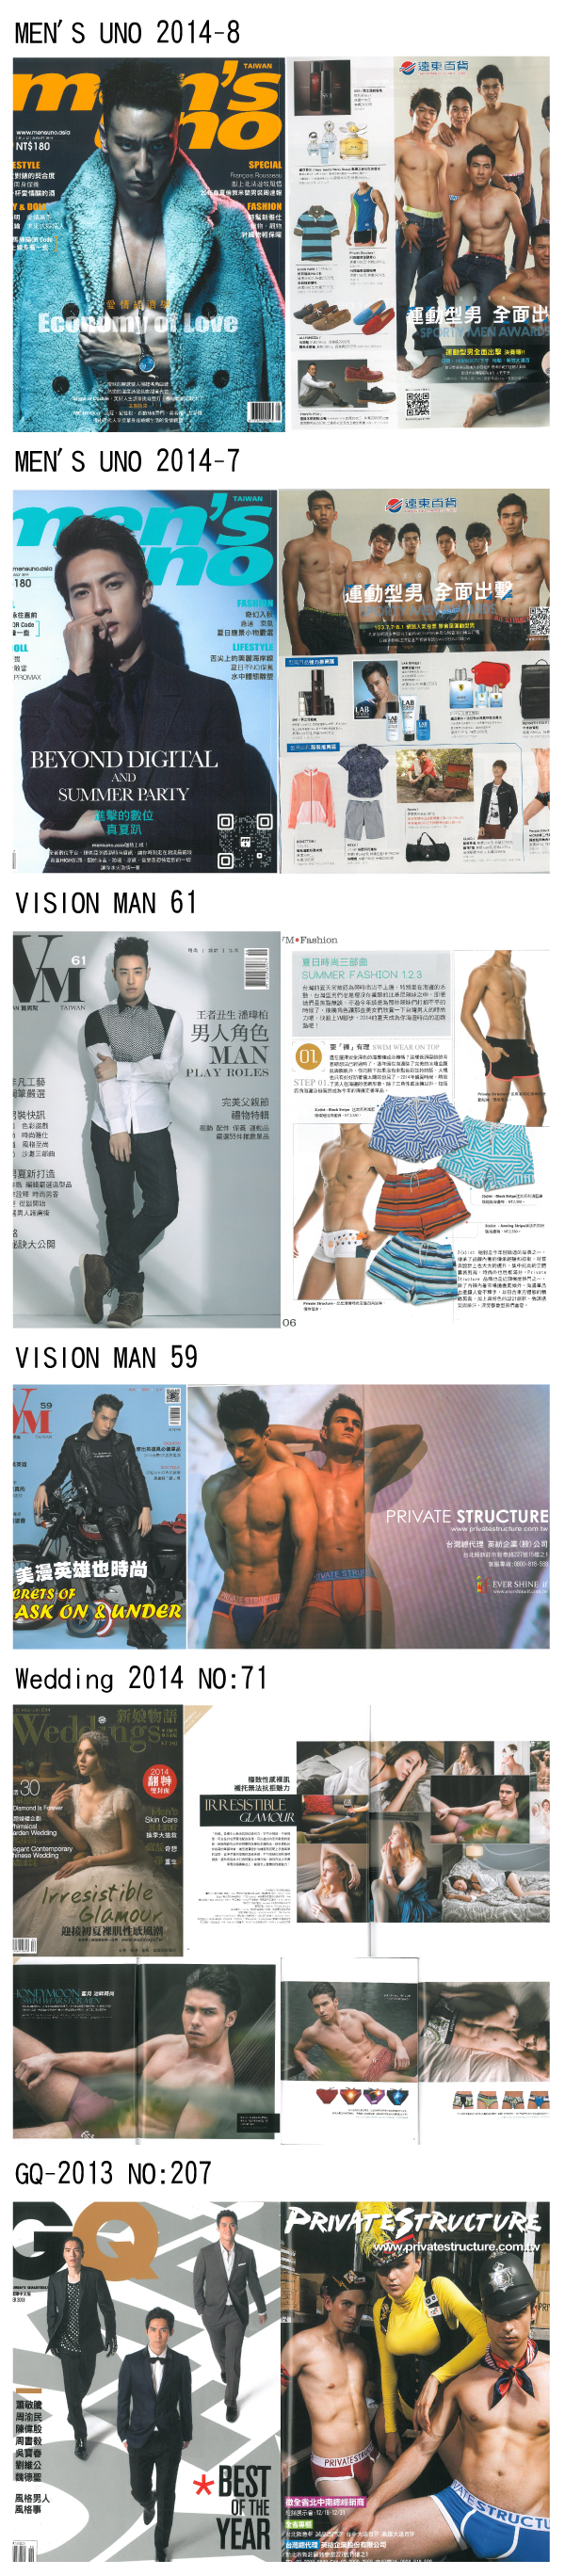 http://www.momoshop.com.tw/expertimg/0003/737/813/ps-magazine.jpg?t=1448902075